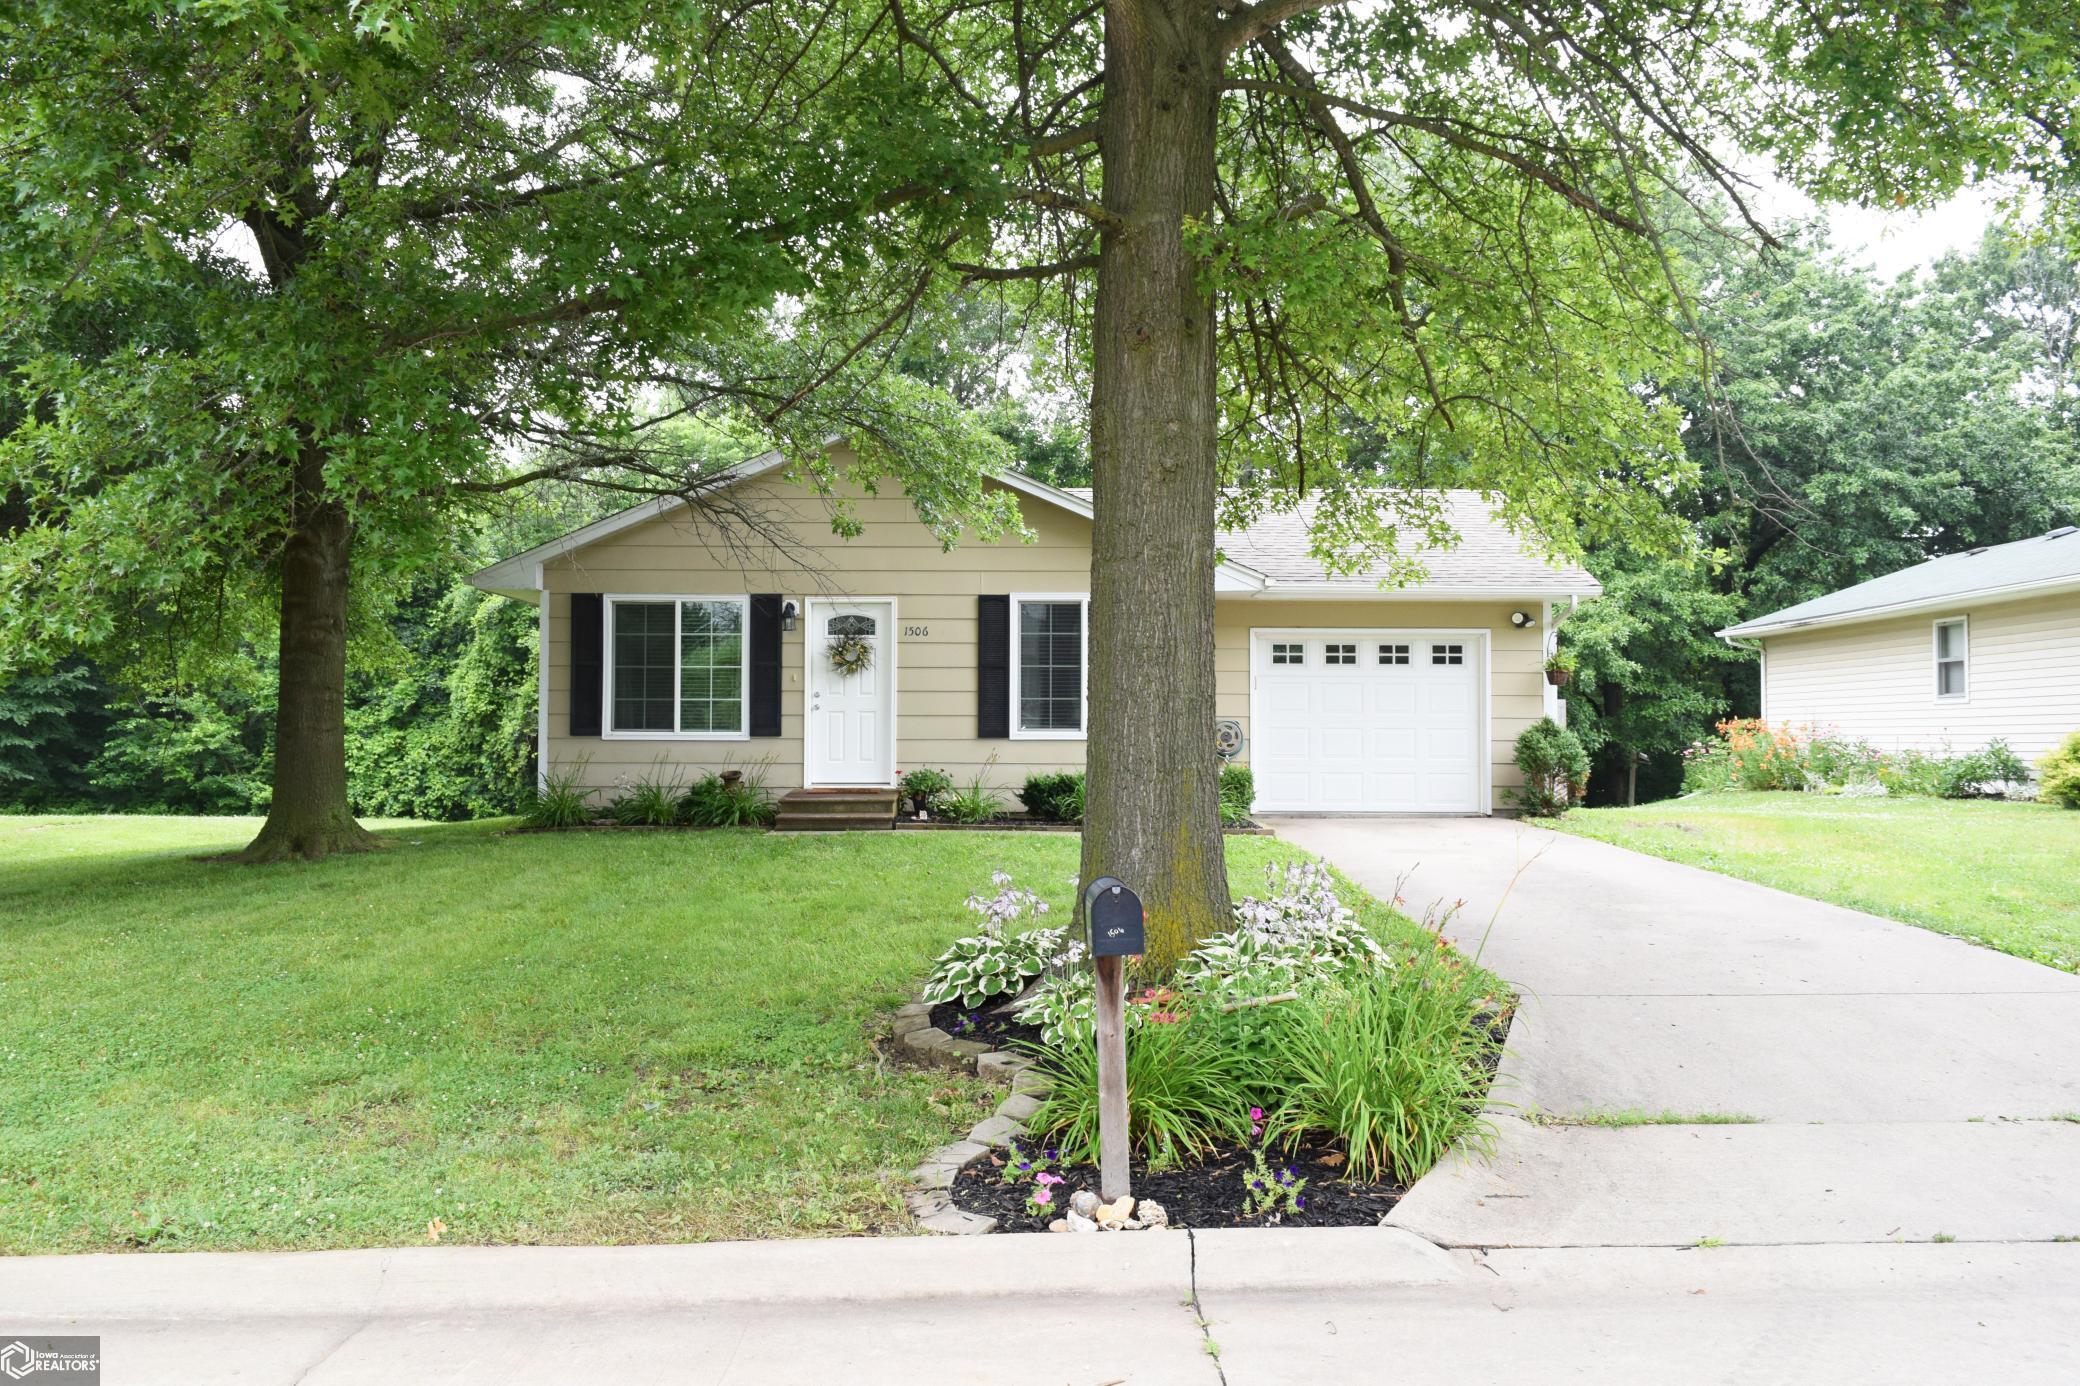 1506 Woodside Property Photo - Fairfield, IA real estate listing